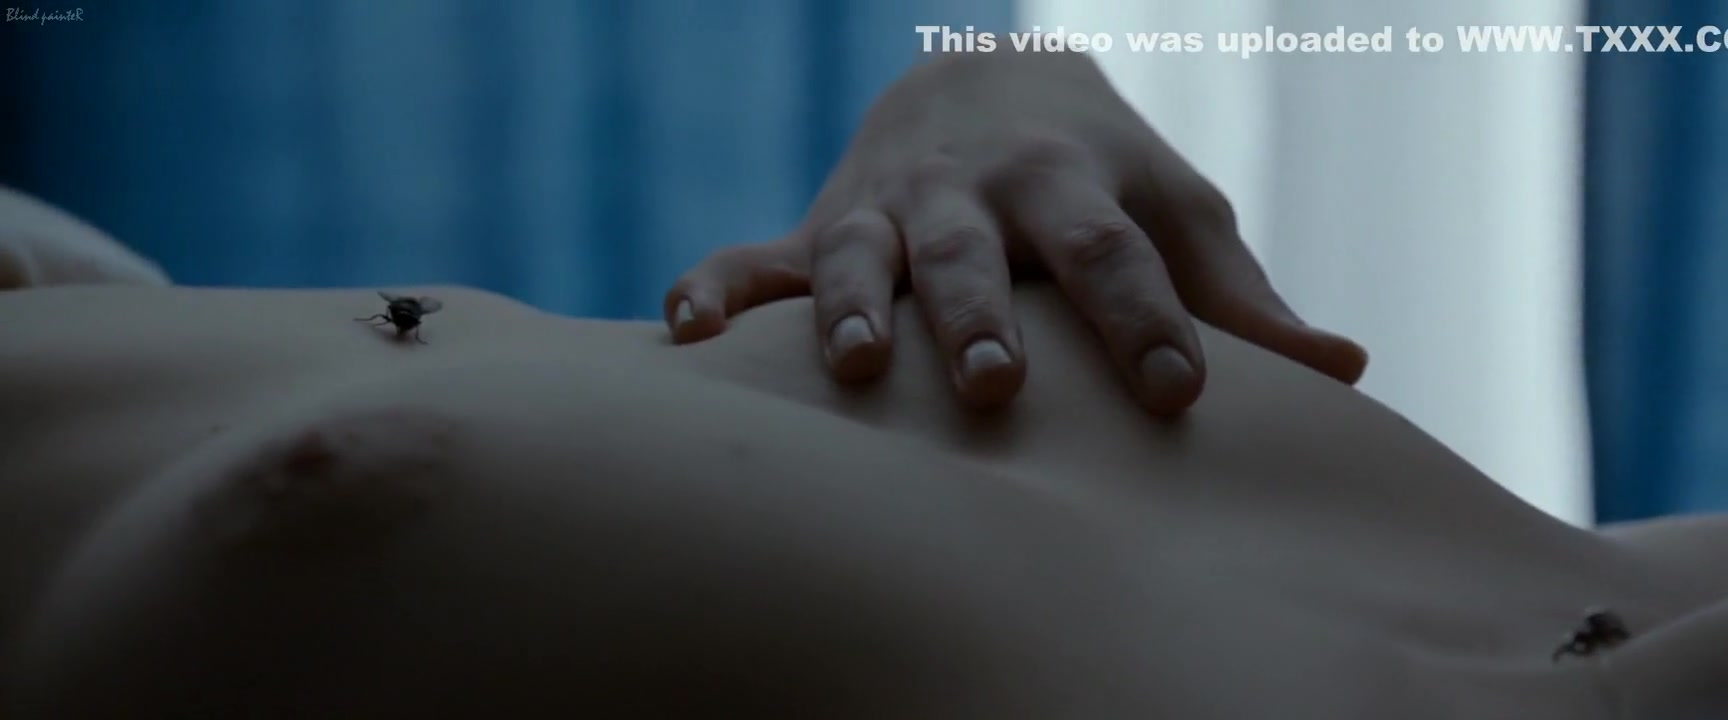 Hot xXx Video Naked girl old guy